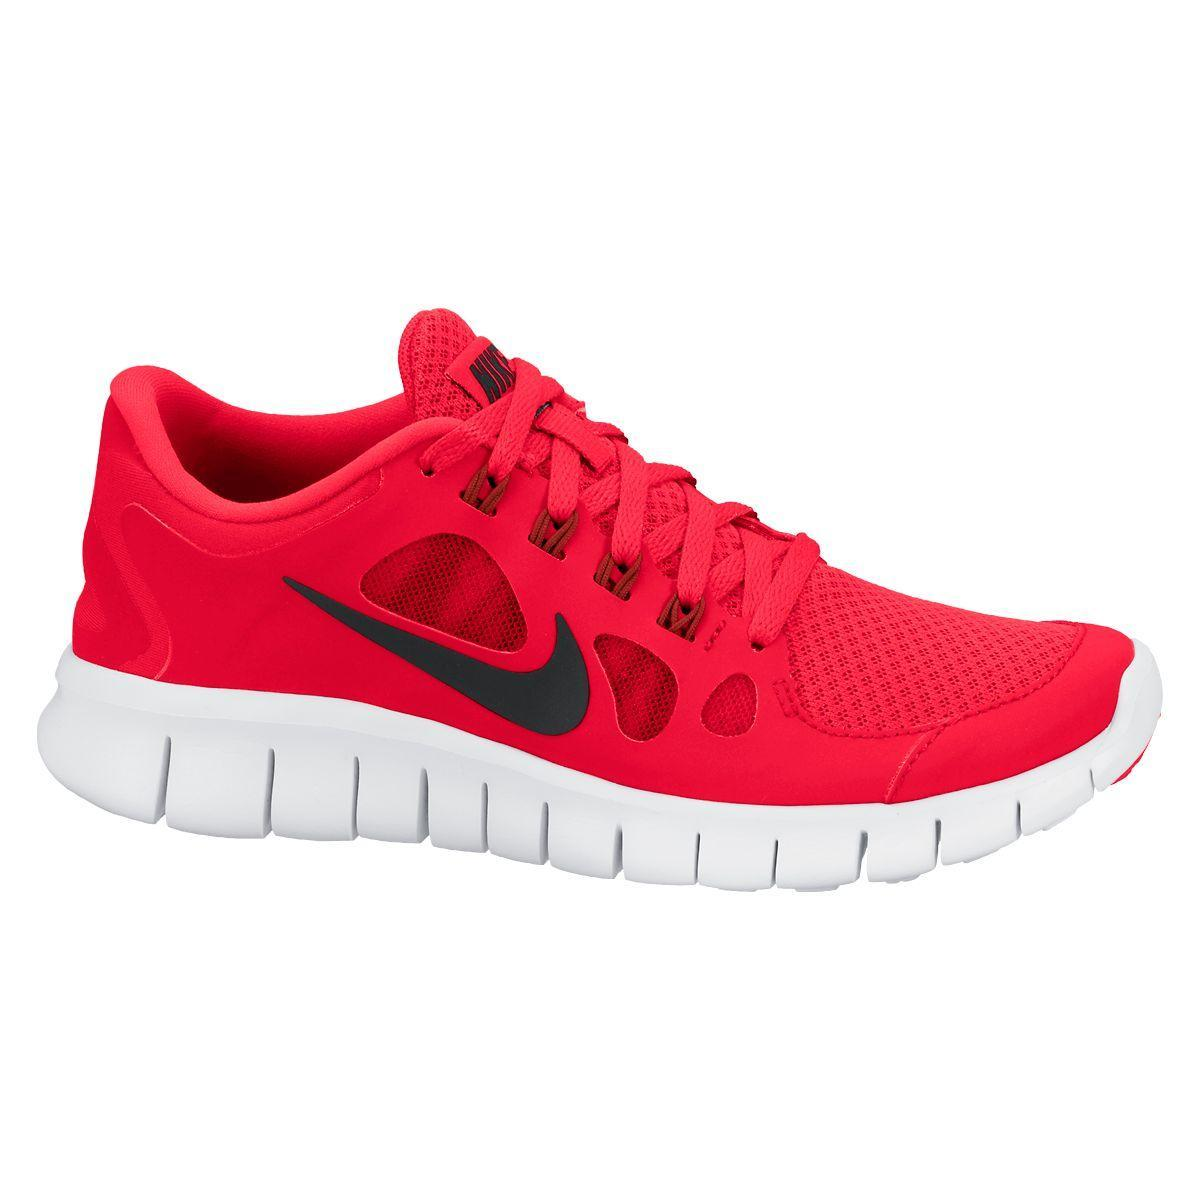 8f43d5a11a8 Nike Boys Free 5.0+ Running Shoes - Red - Tennisnuts.com